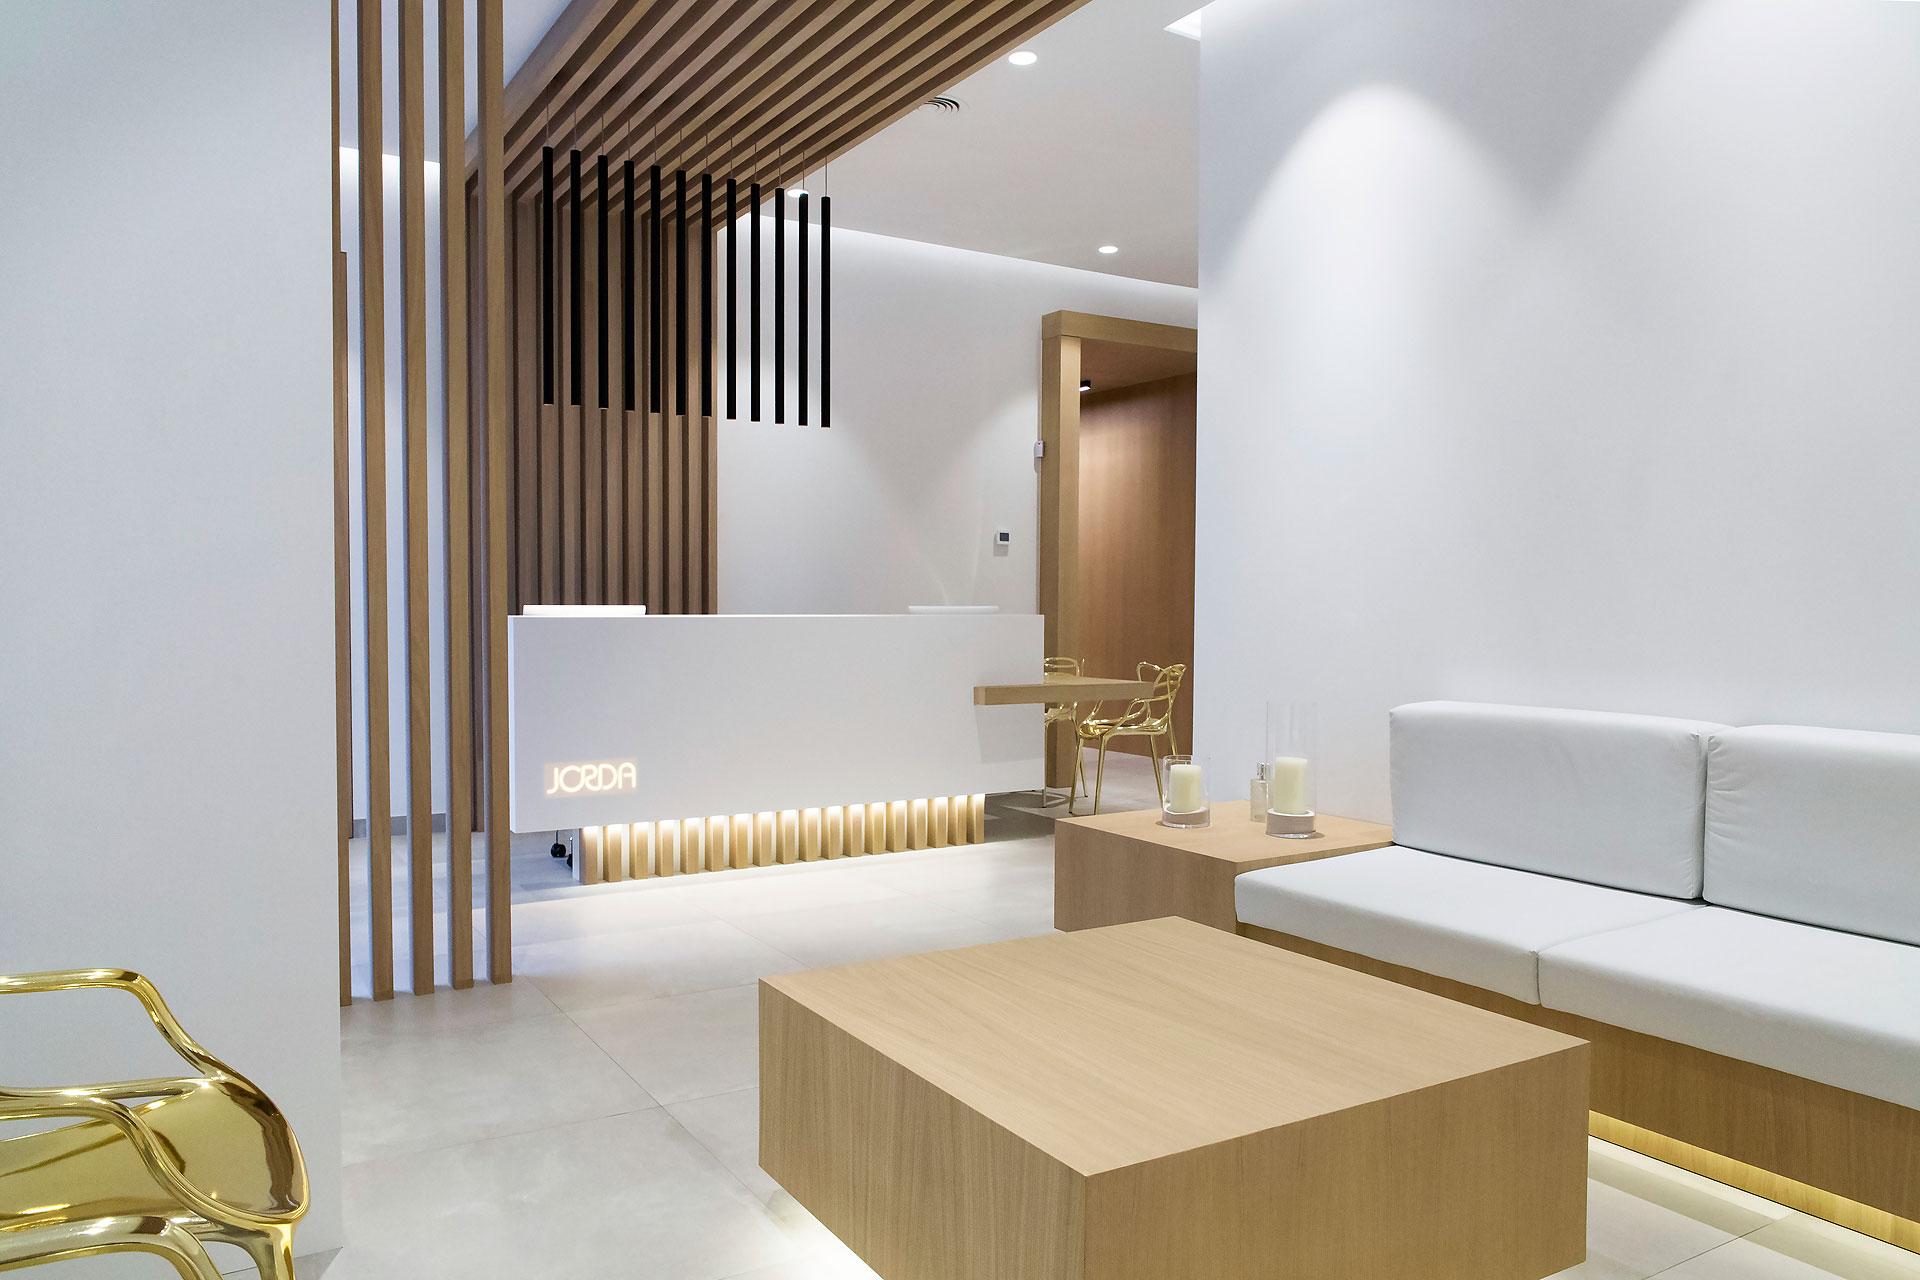 Cl nica odontol gica dise ada por bano arquitectura interior for Programas 3d interiorismo